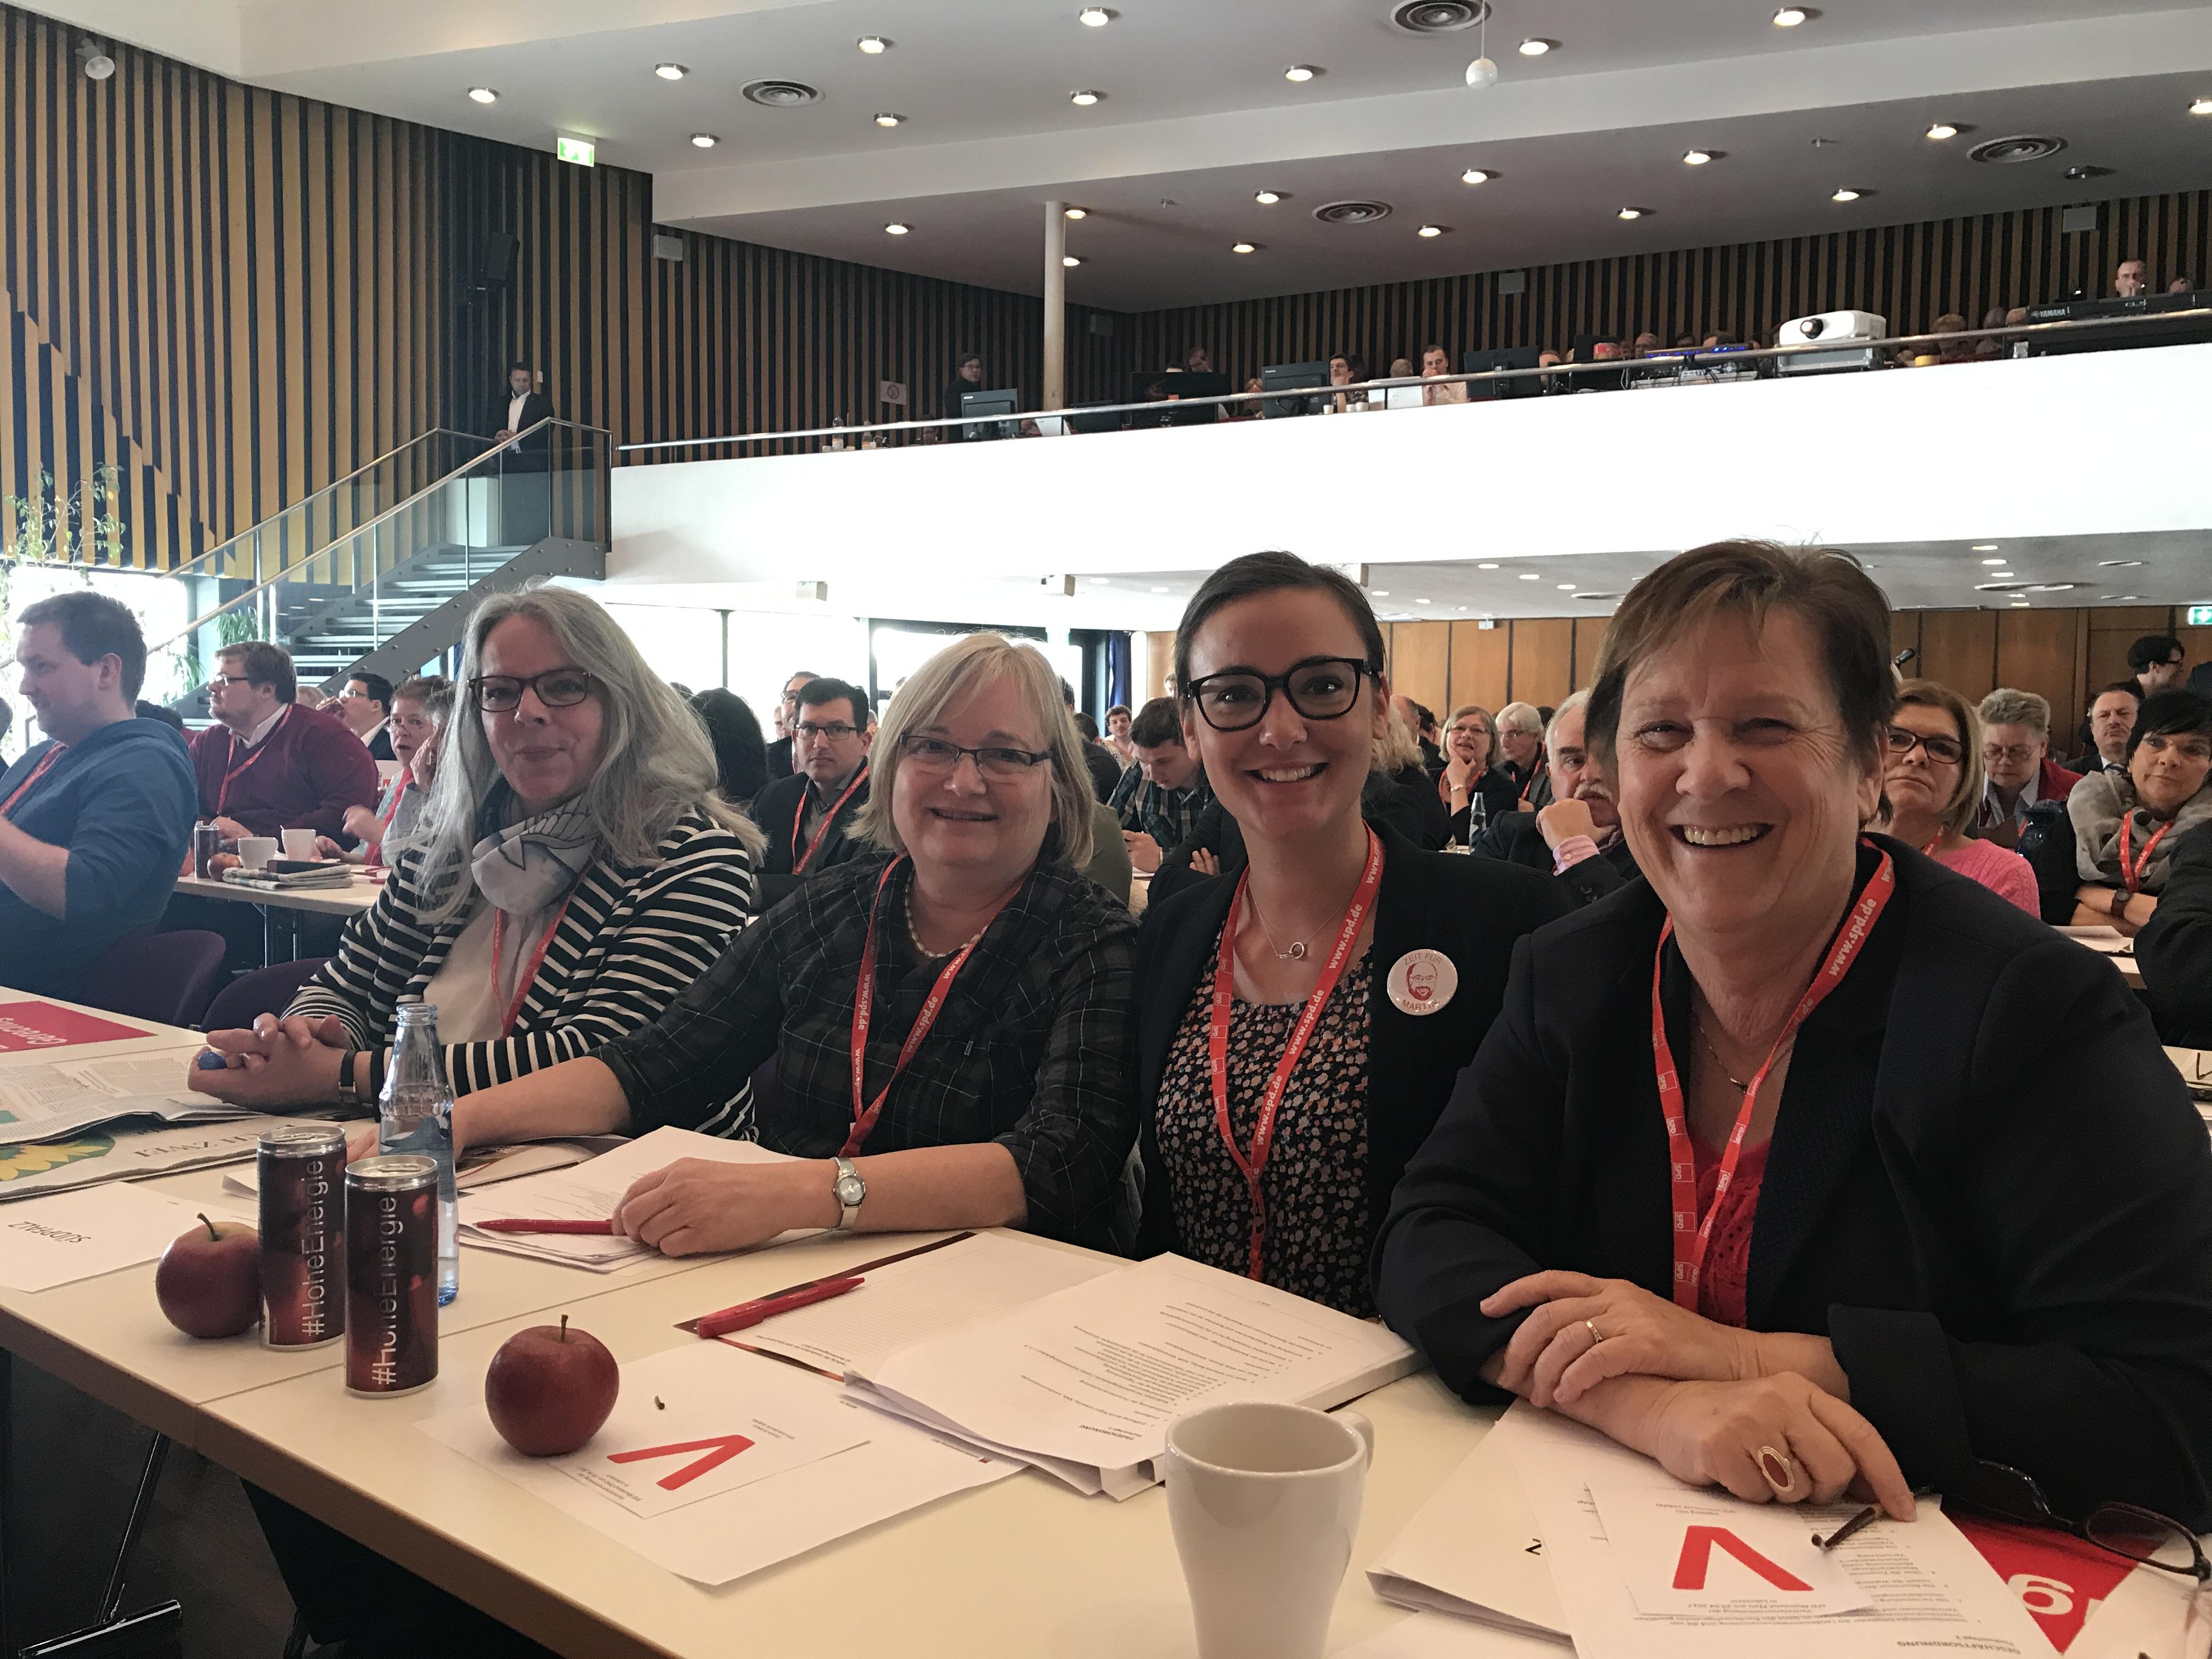 v.l.n.r. Dagmar Keck-Waldhauser, Ingrid Allbrecht, Carolin Eichhorn und Inge Volz